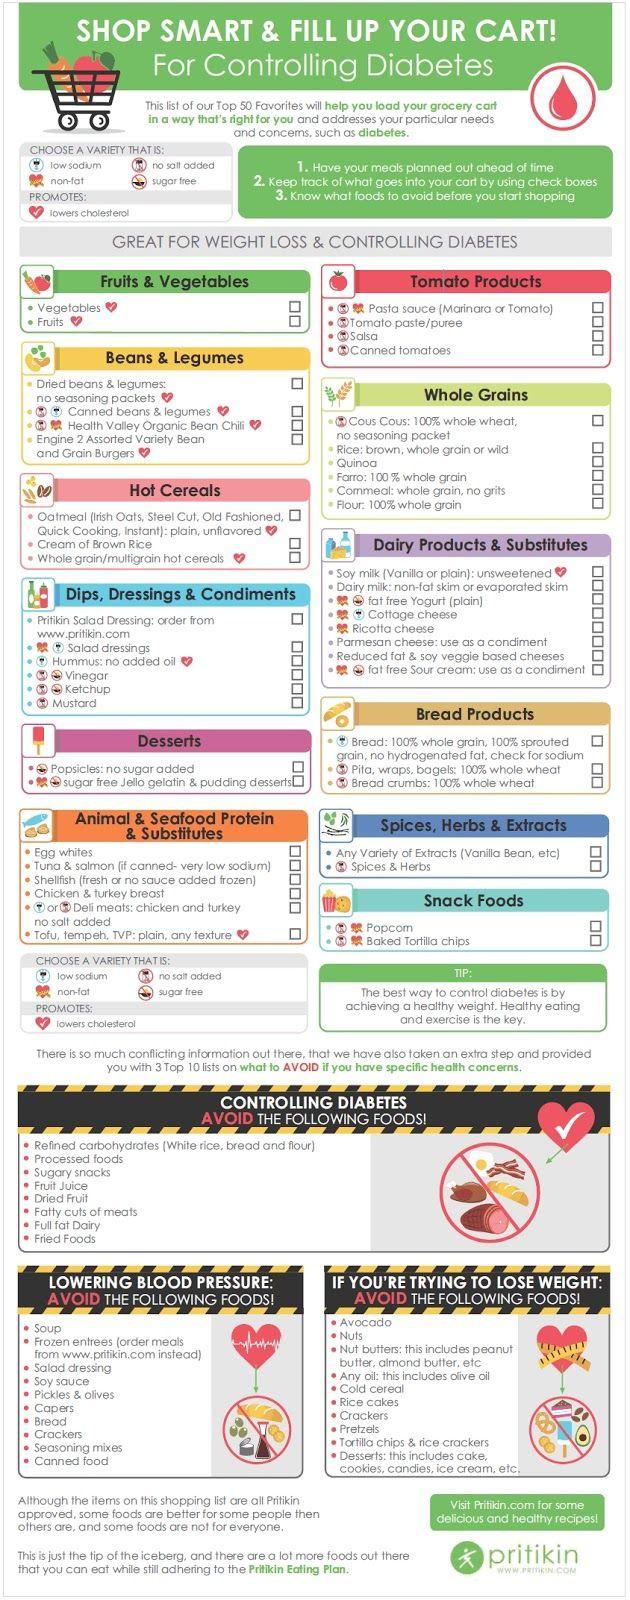 320 best Diabetic Blog Posts/News images on Pinterest | Health ...